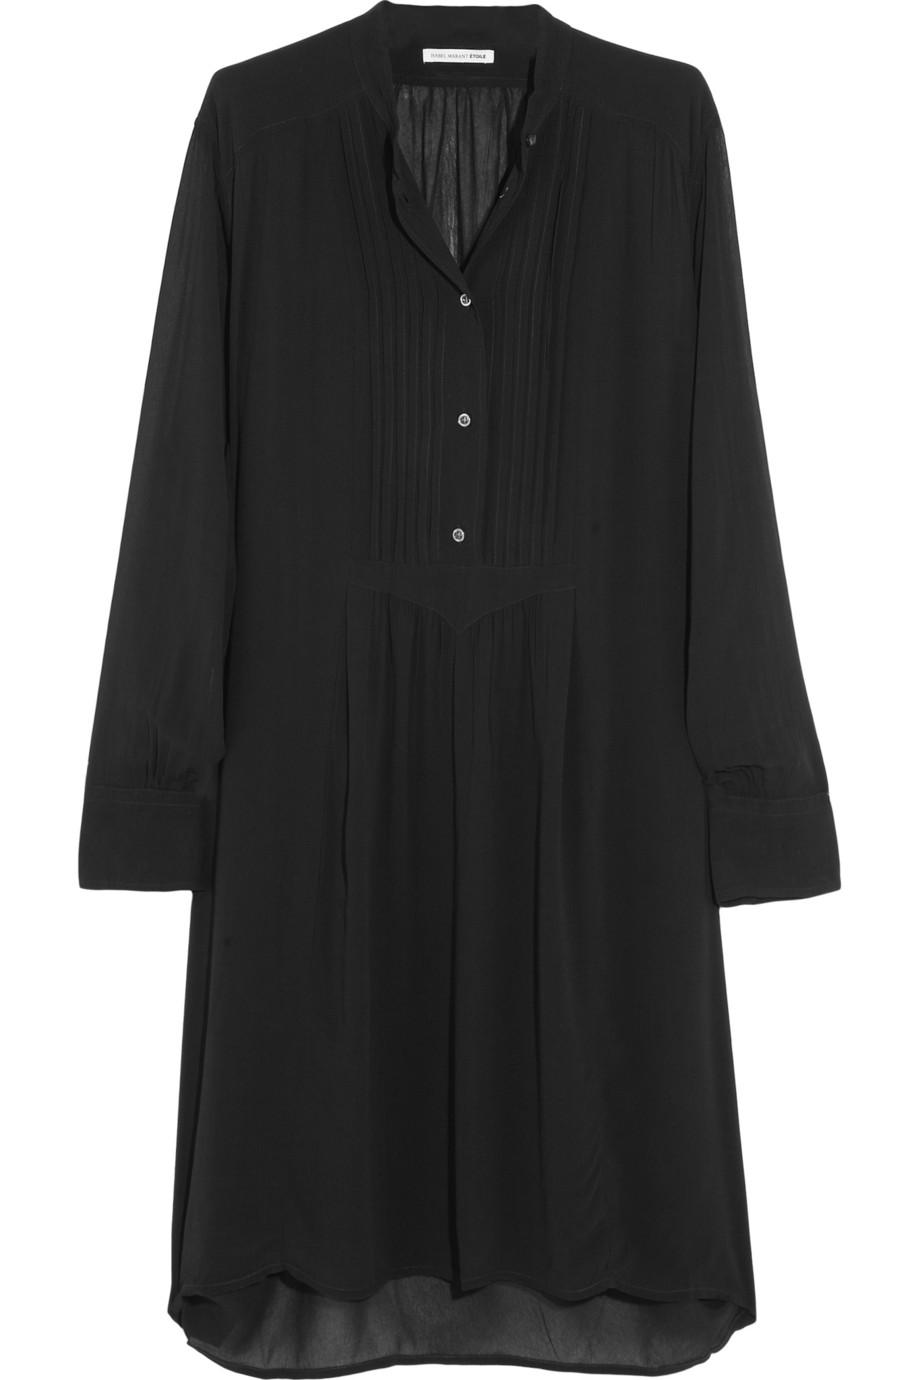 ÉTOILE ISABEL MARANT Bray pleated georgette dress, $440,  net-a-porter.com